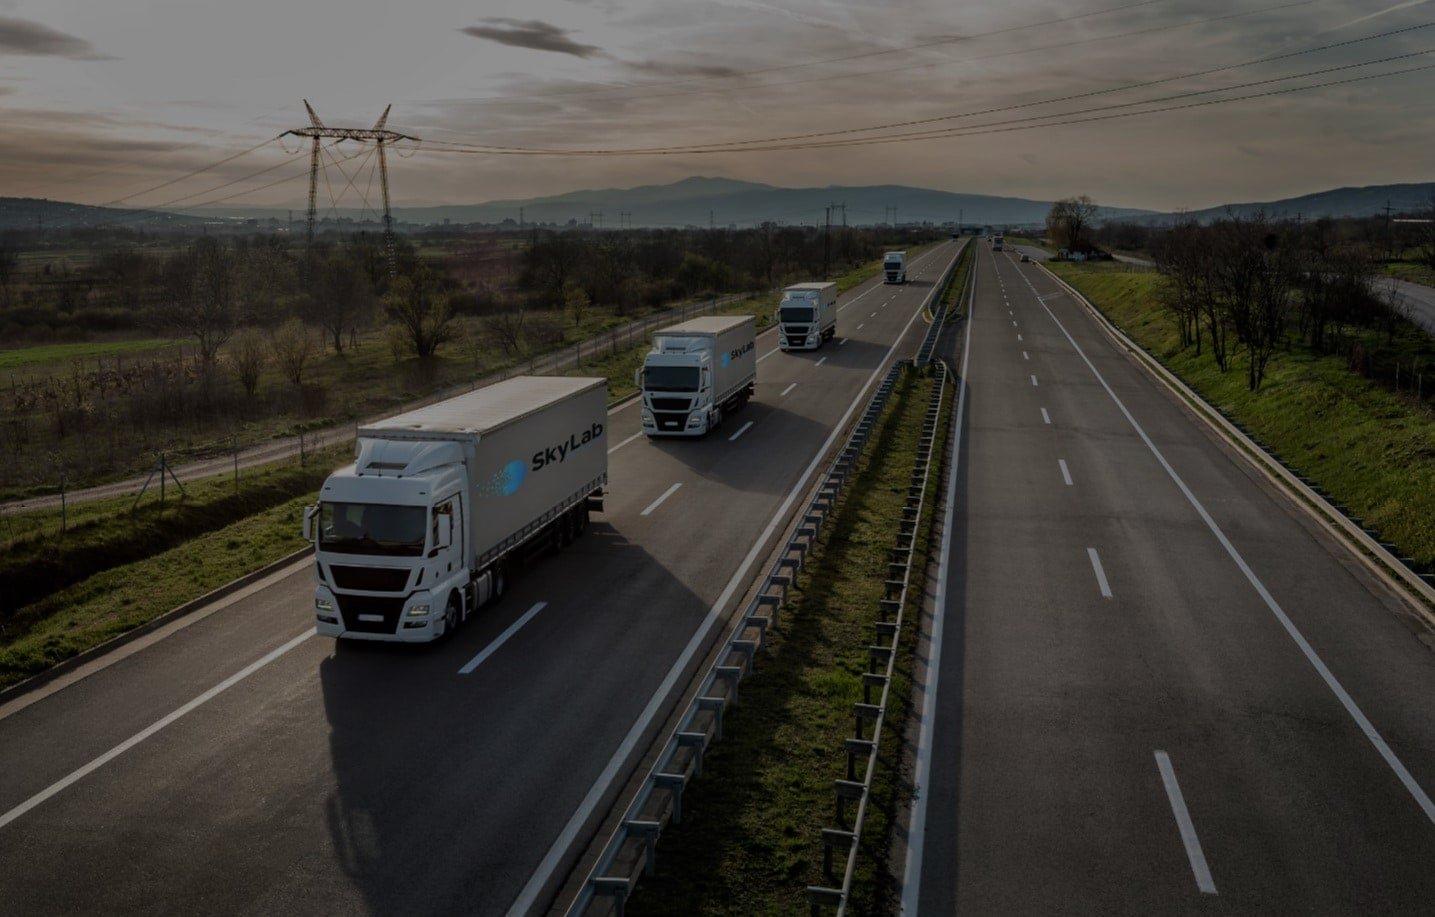 SkyLab Trucks